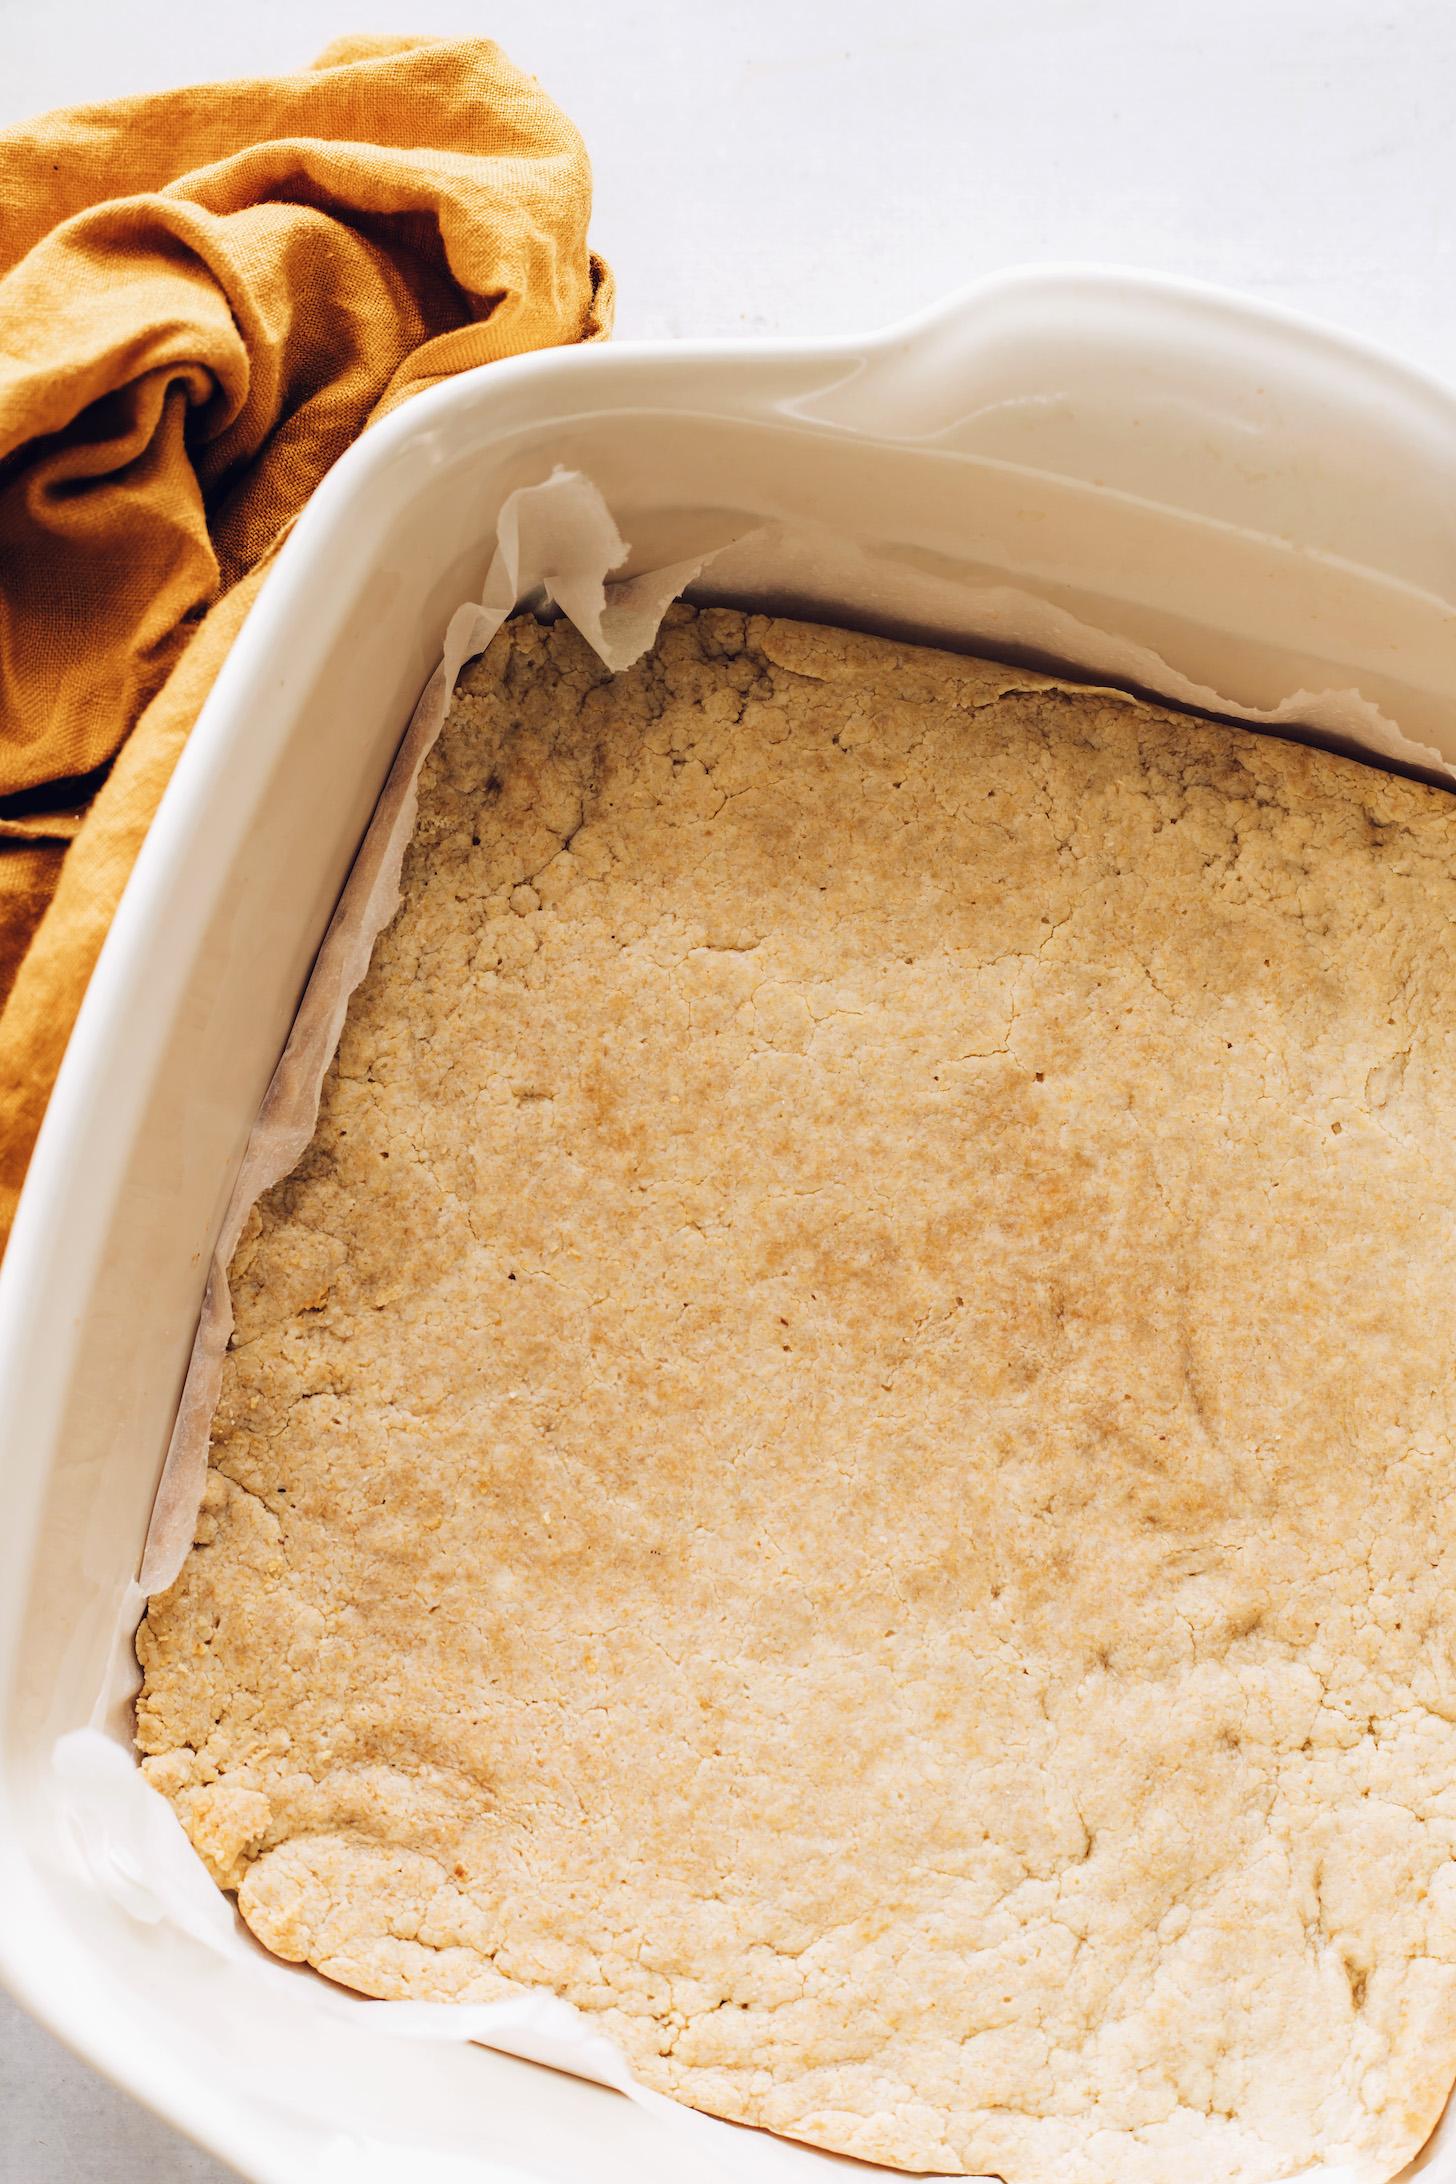 Pan of homemade Twix bars crust